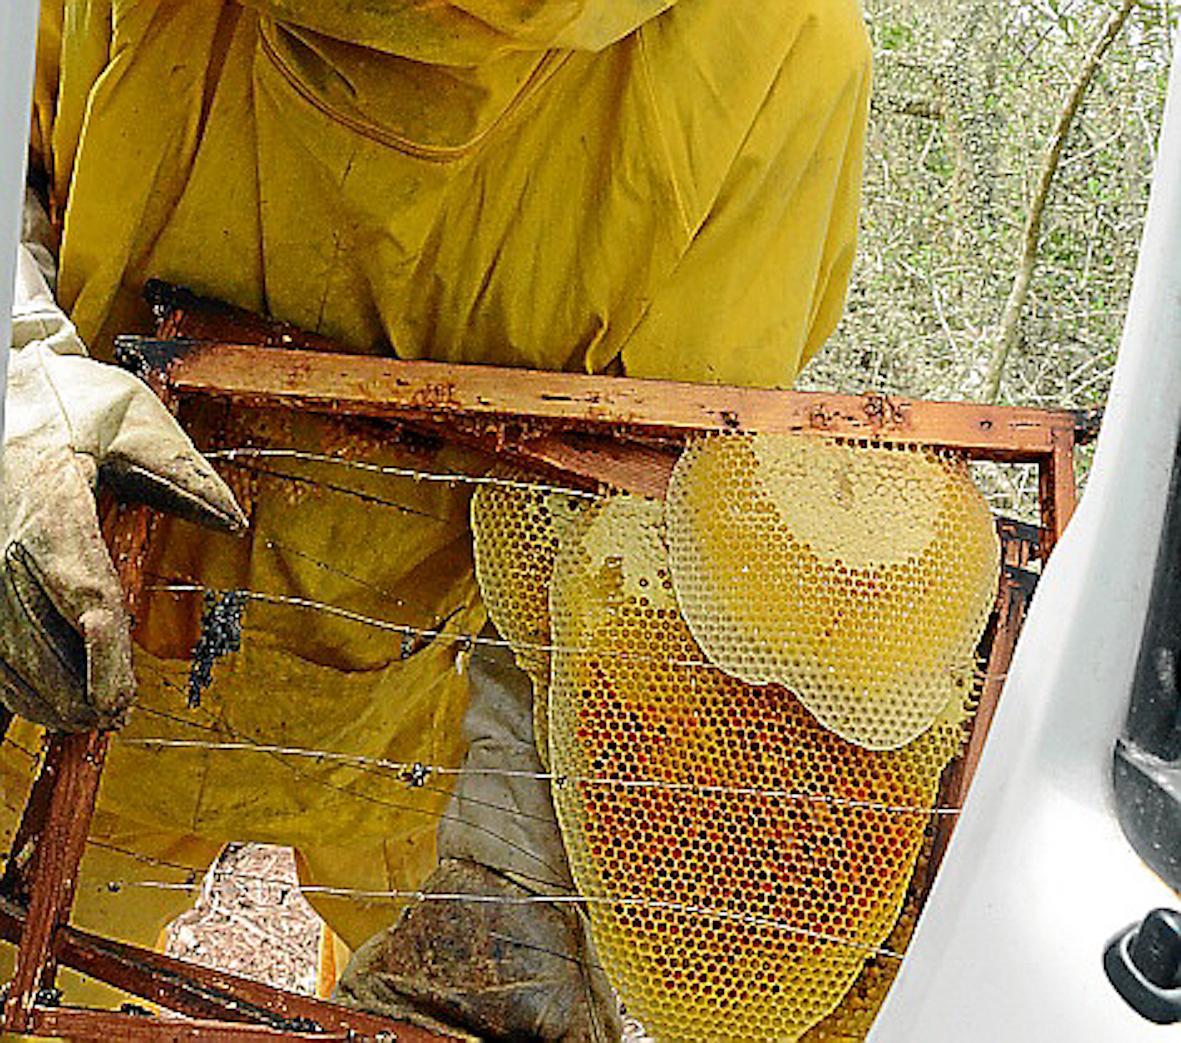 Tomeu Pizá collecting honey.